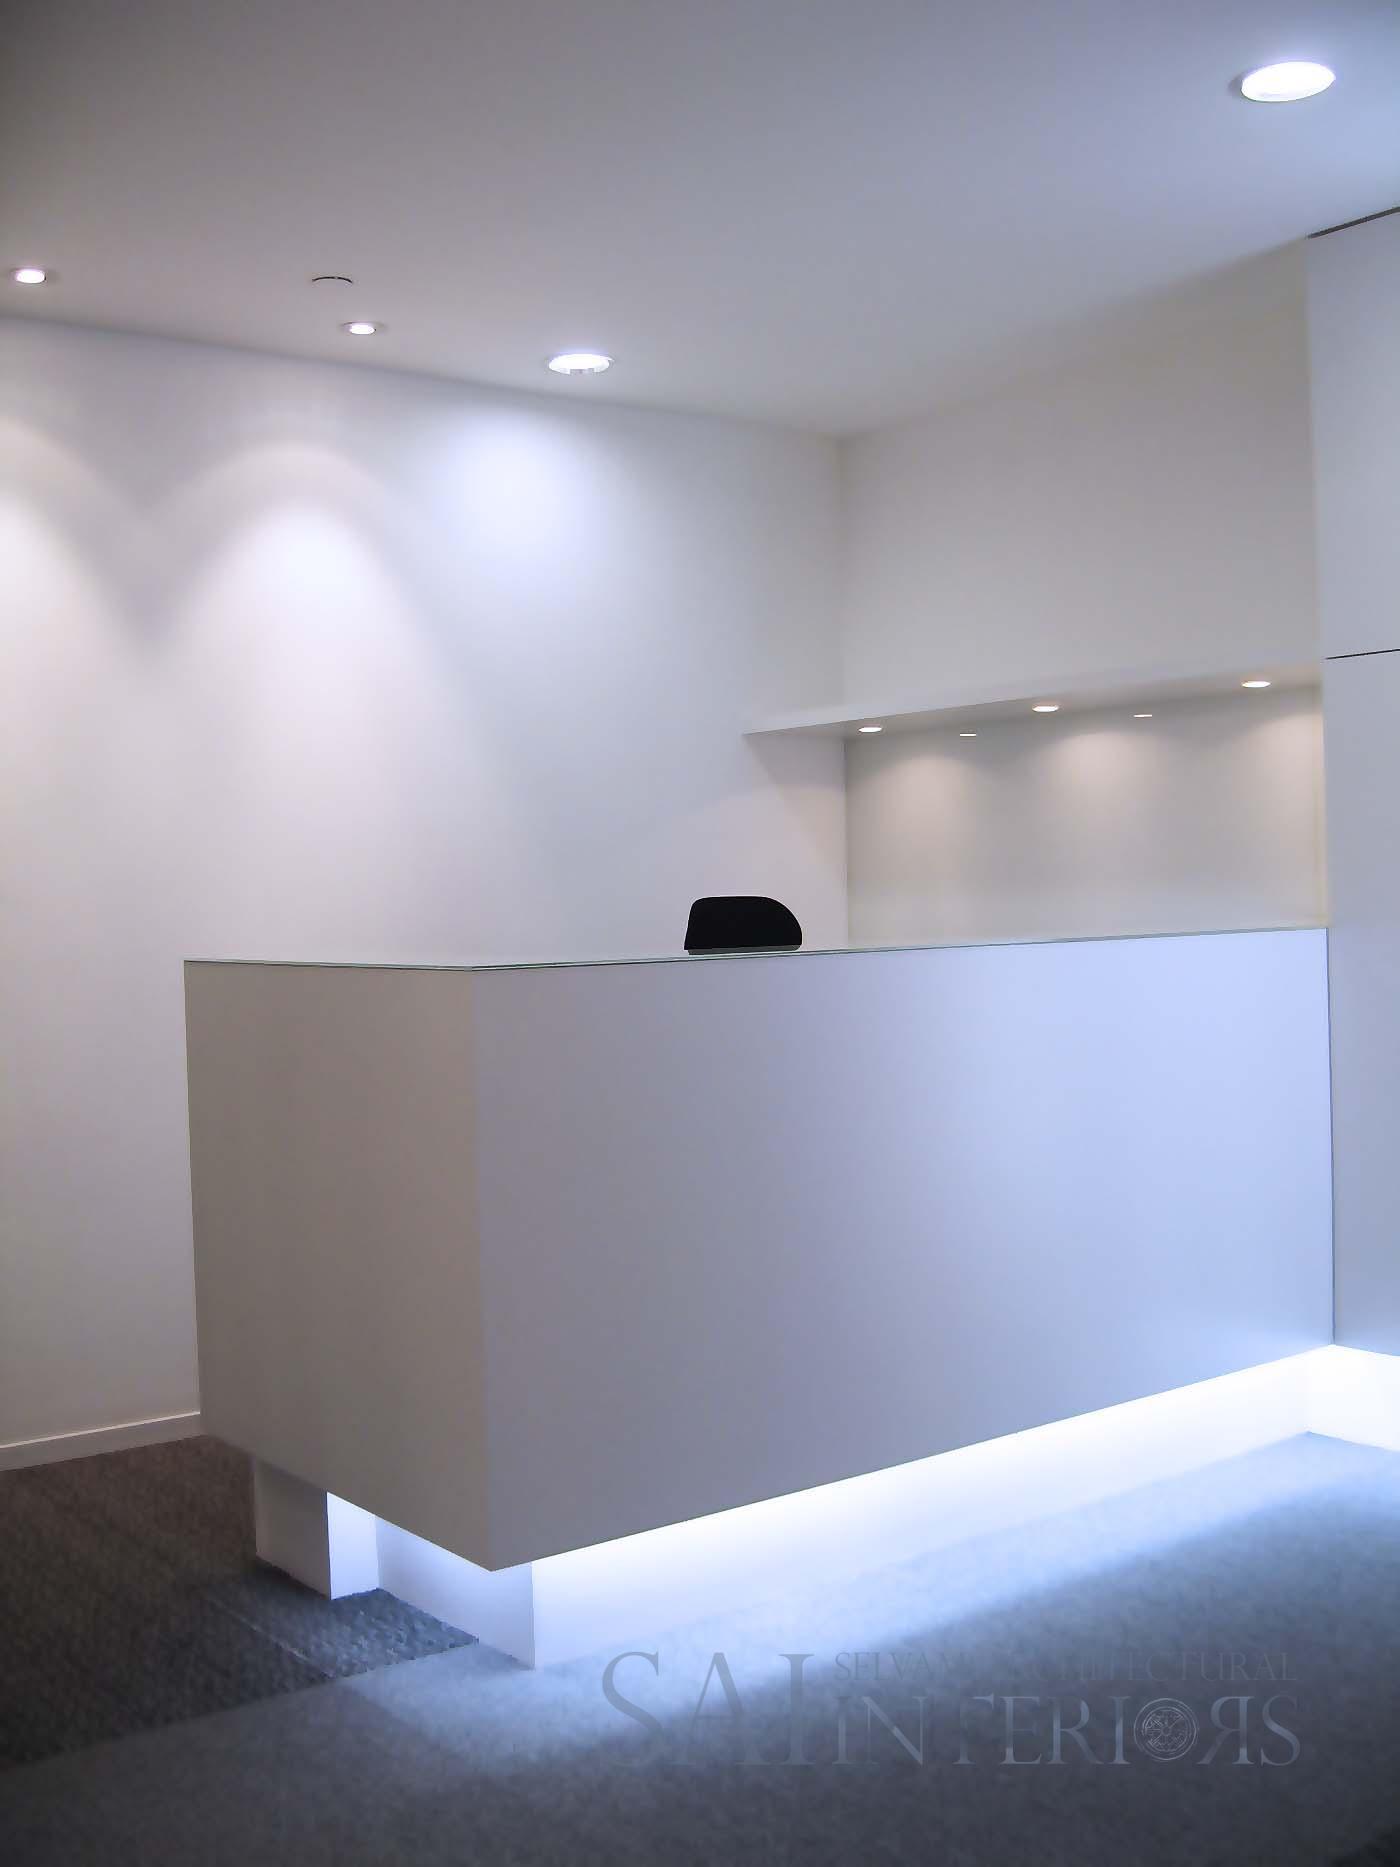 Office Cubicle Design Corporate Office Selvam Architectural Interiors